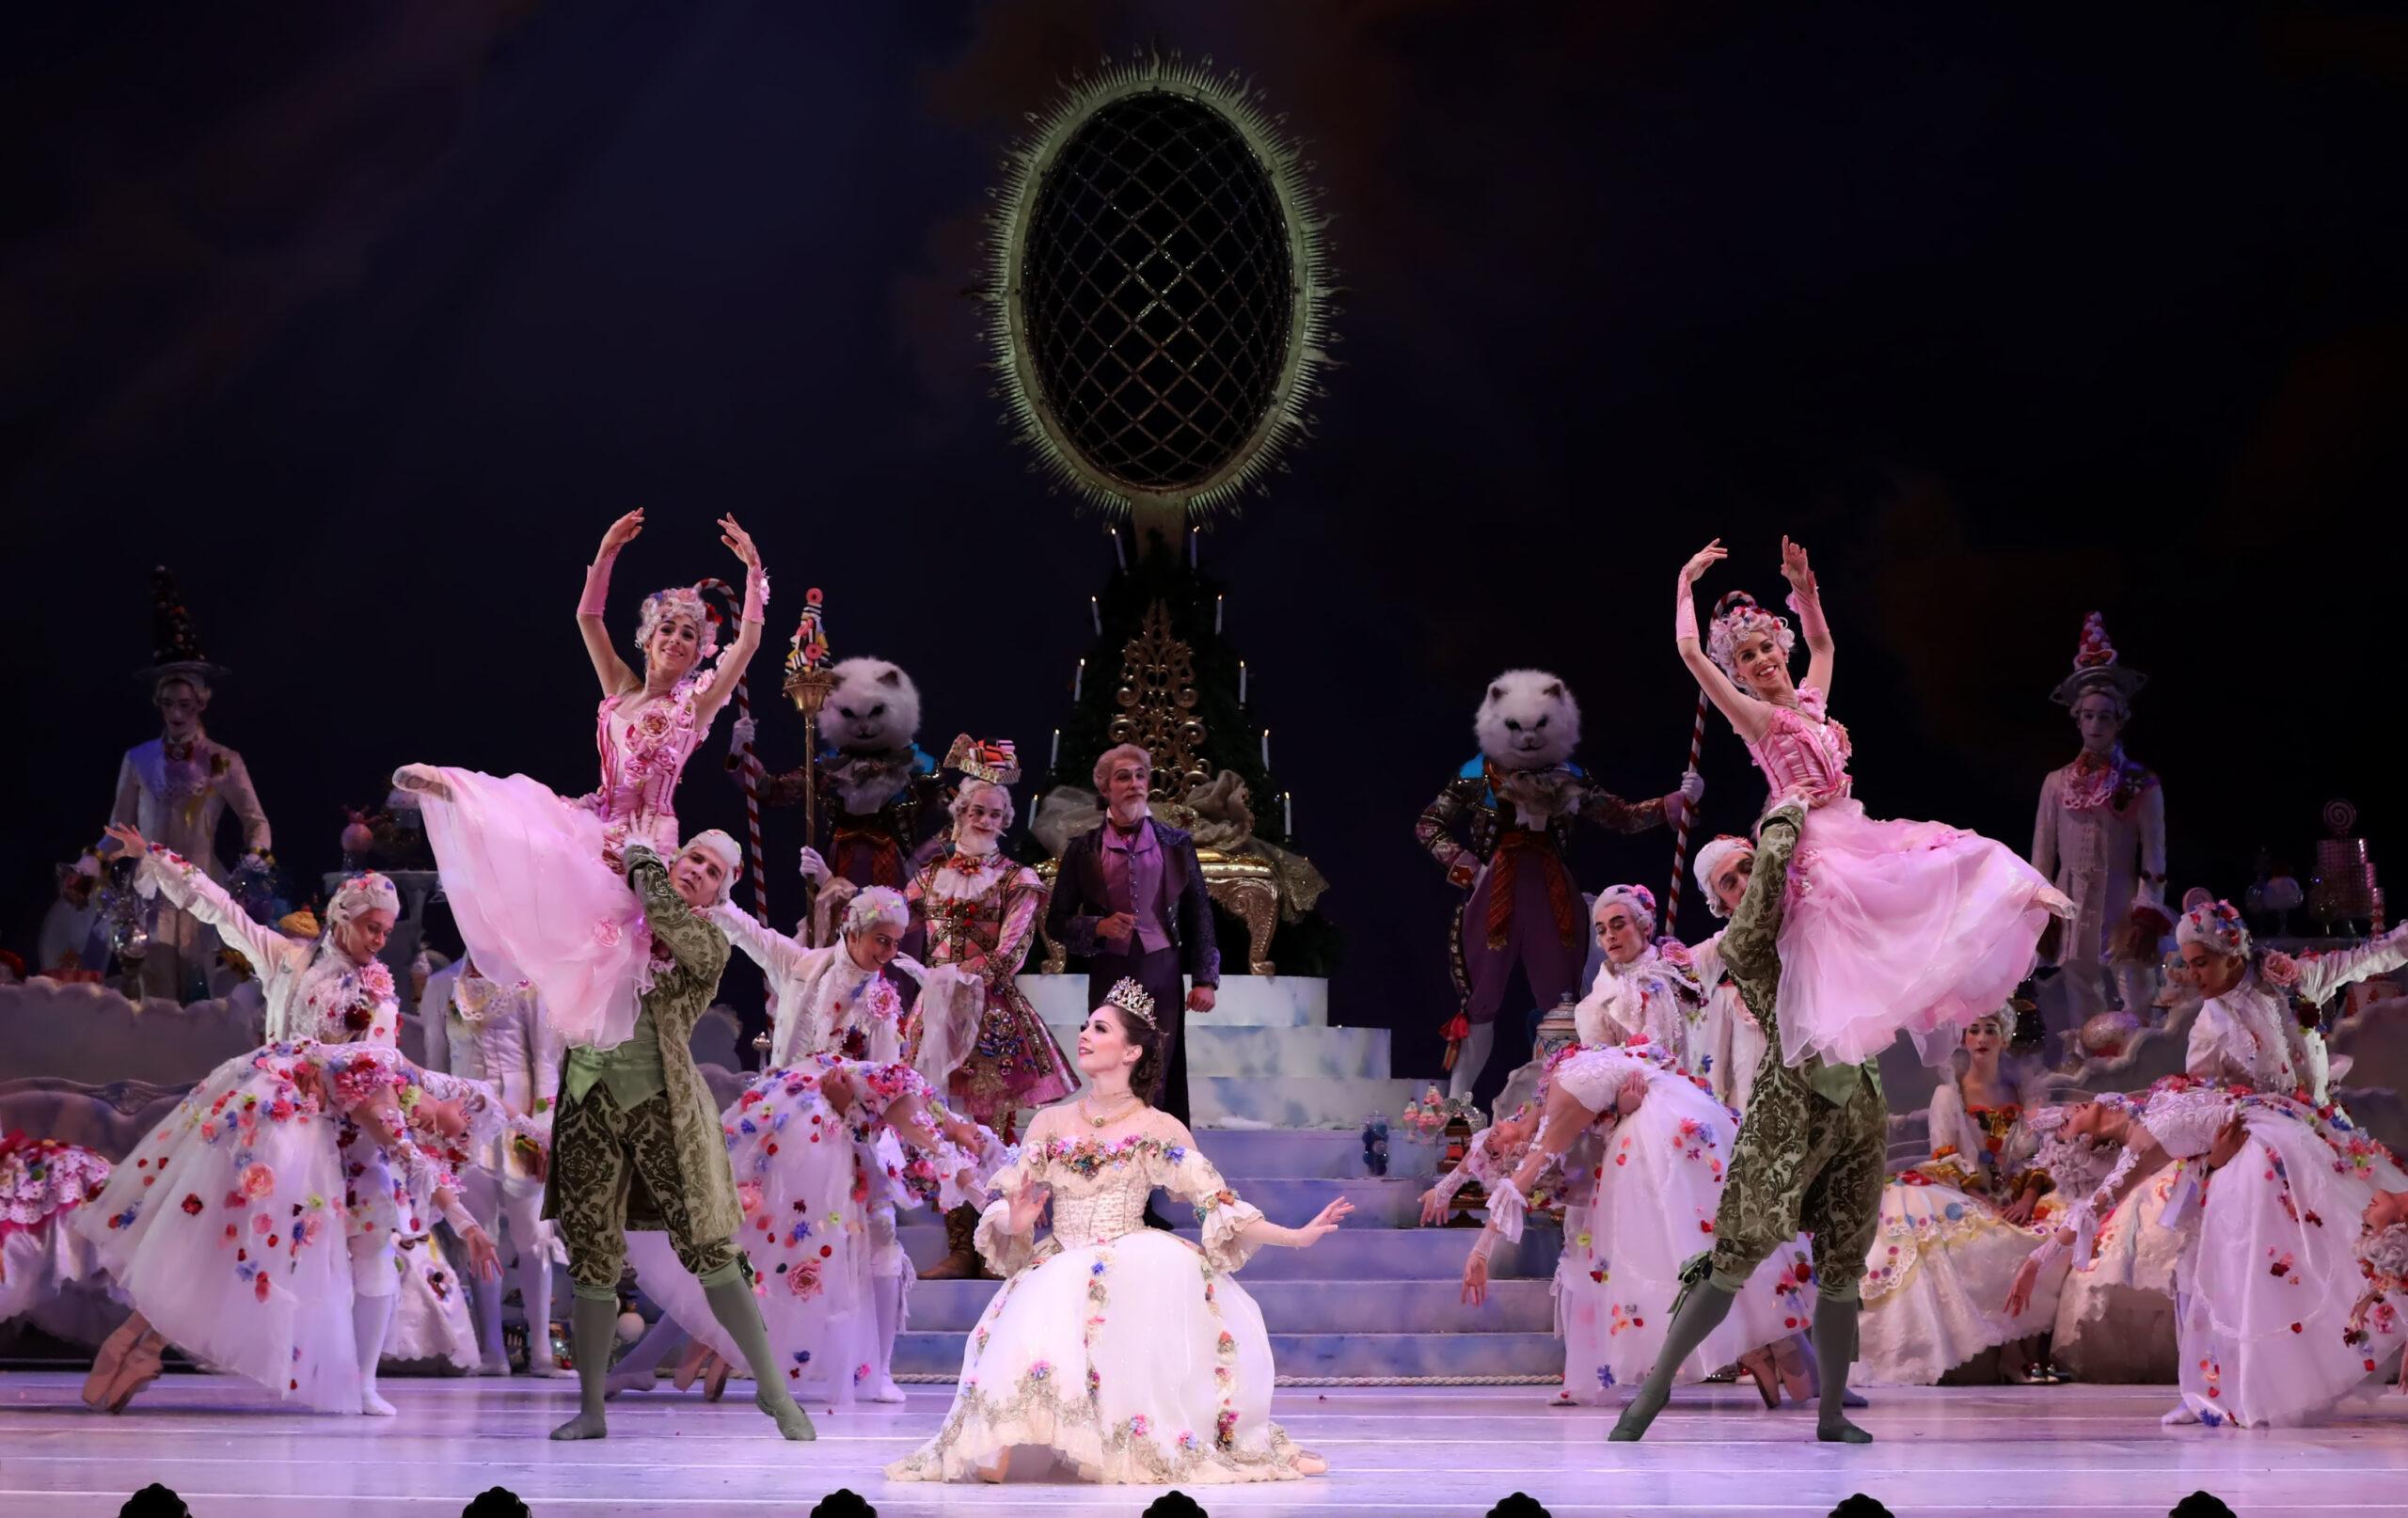 Artists of Houston Ballet in Stanton Welch's The Nutcracker. Photo by Amitava Sarkar (2019), Courtesy of Houston Ballet